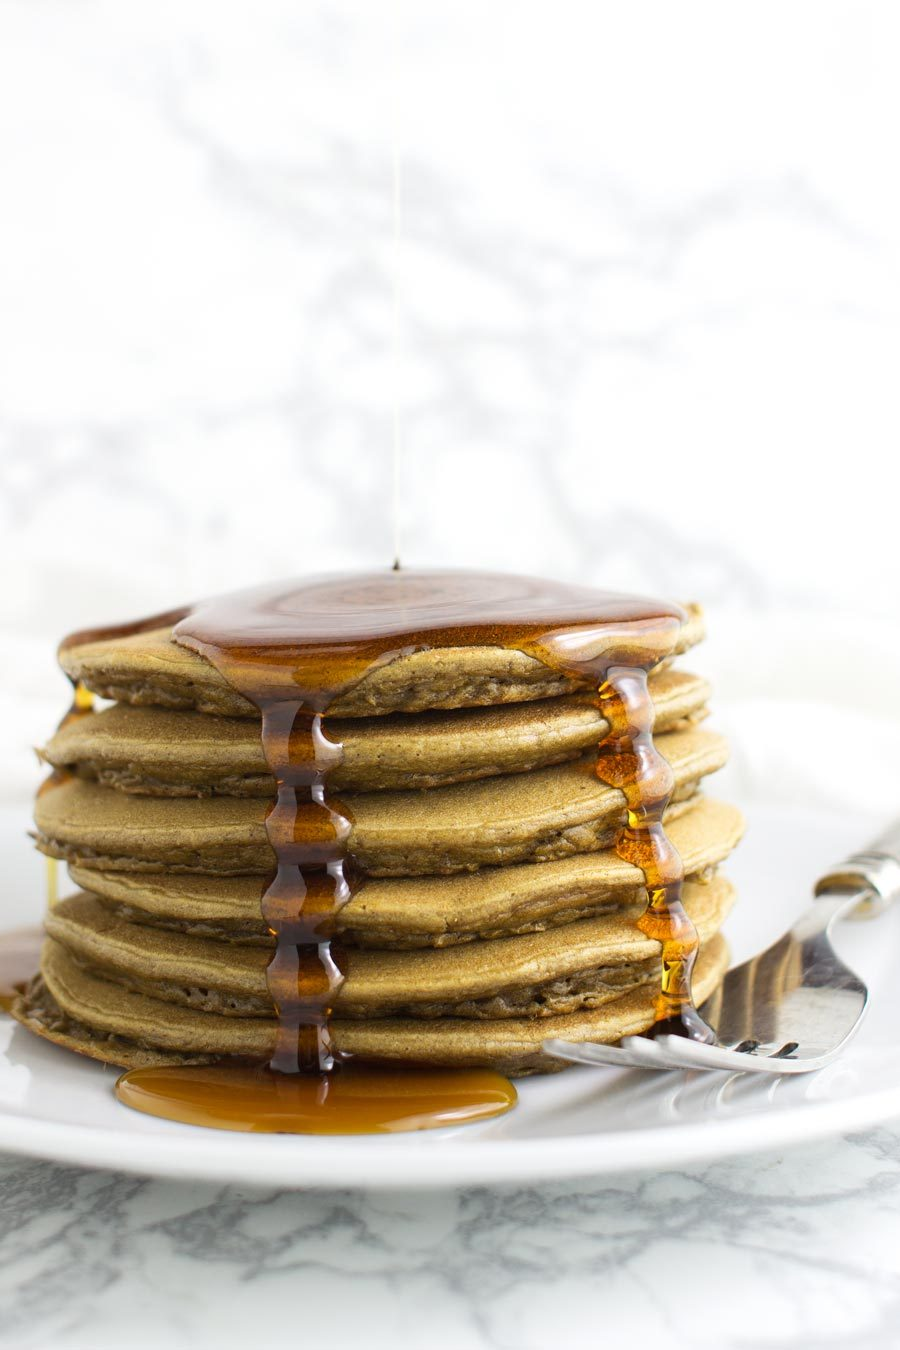 Banana Spice Plantain Pancakes recipe from acleanplate.com #paleo #glutenfree #grainfree